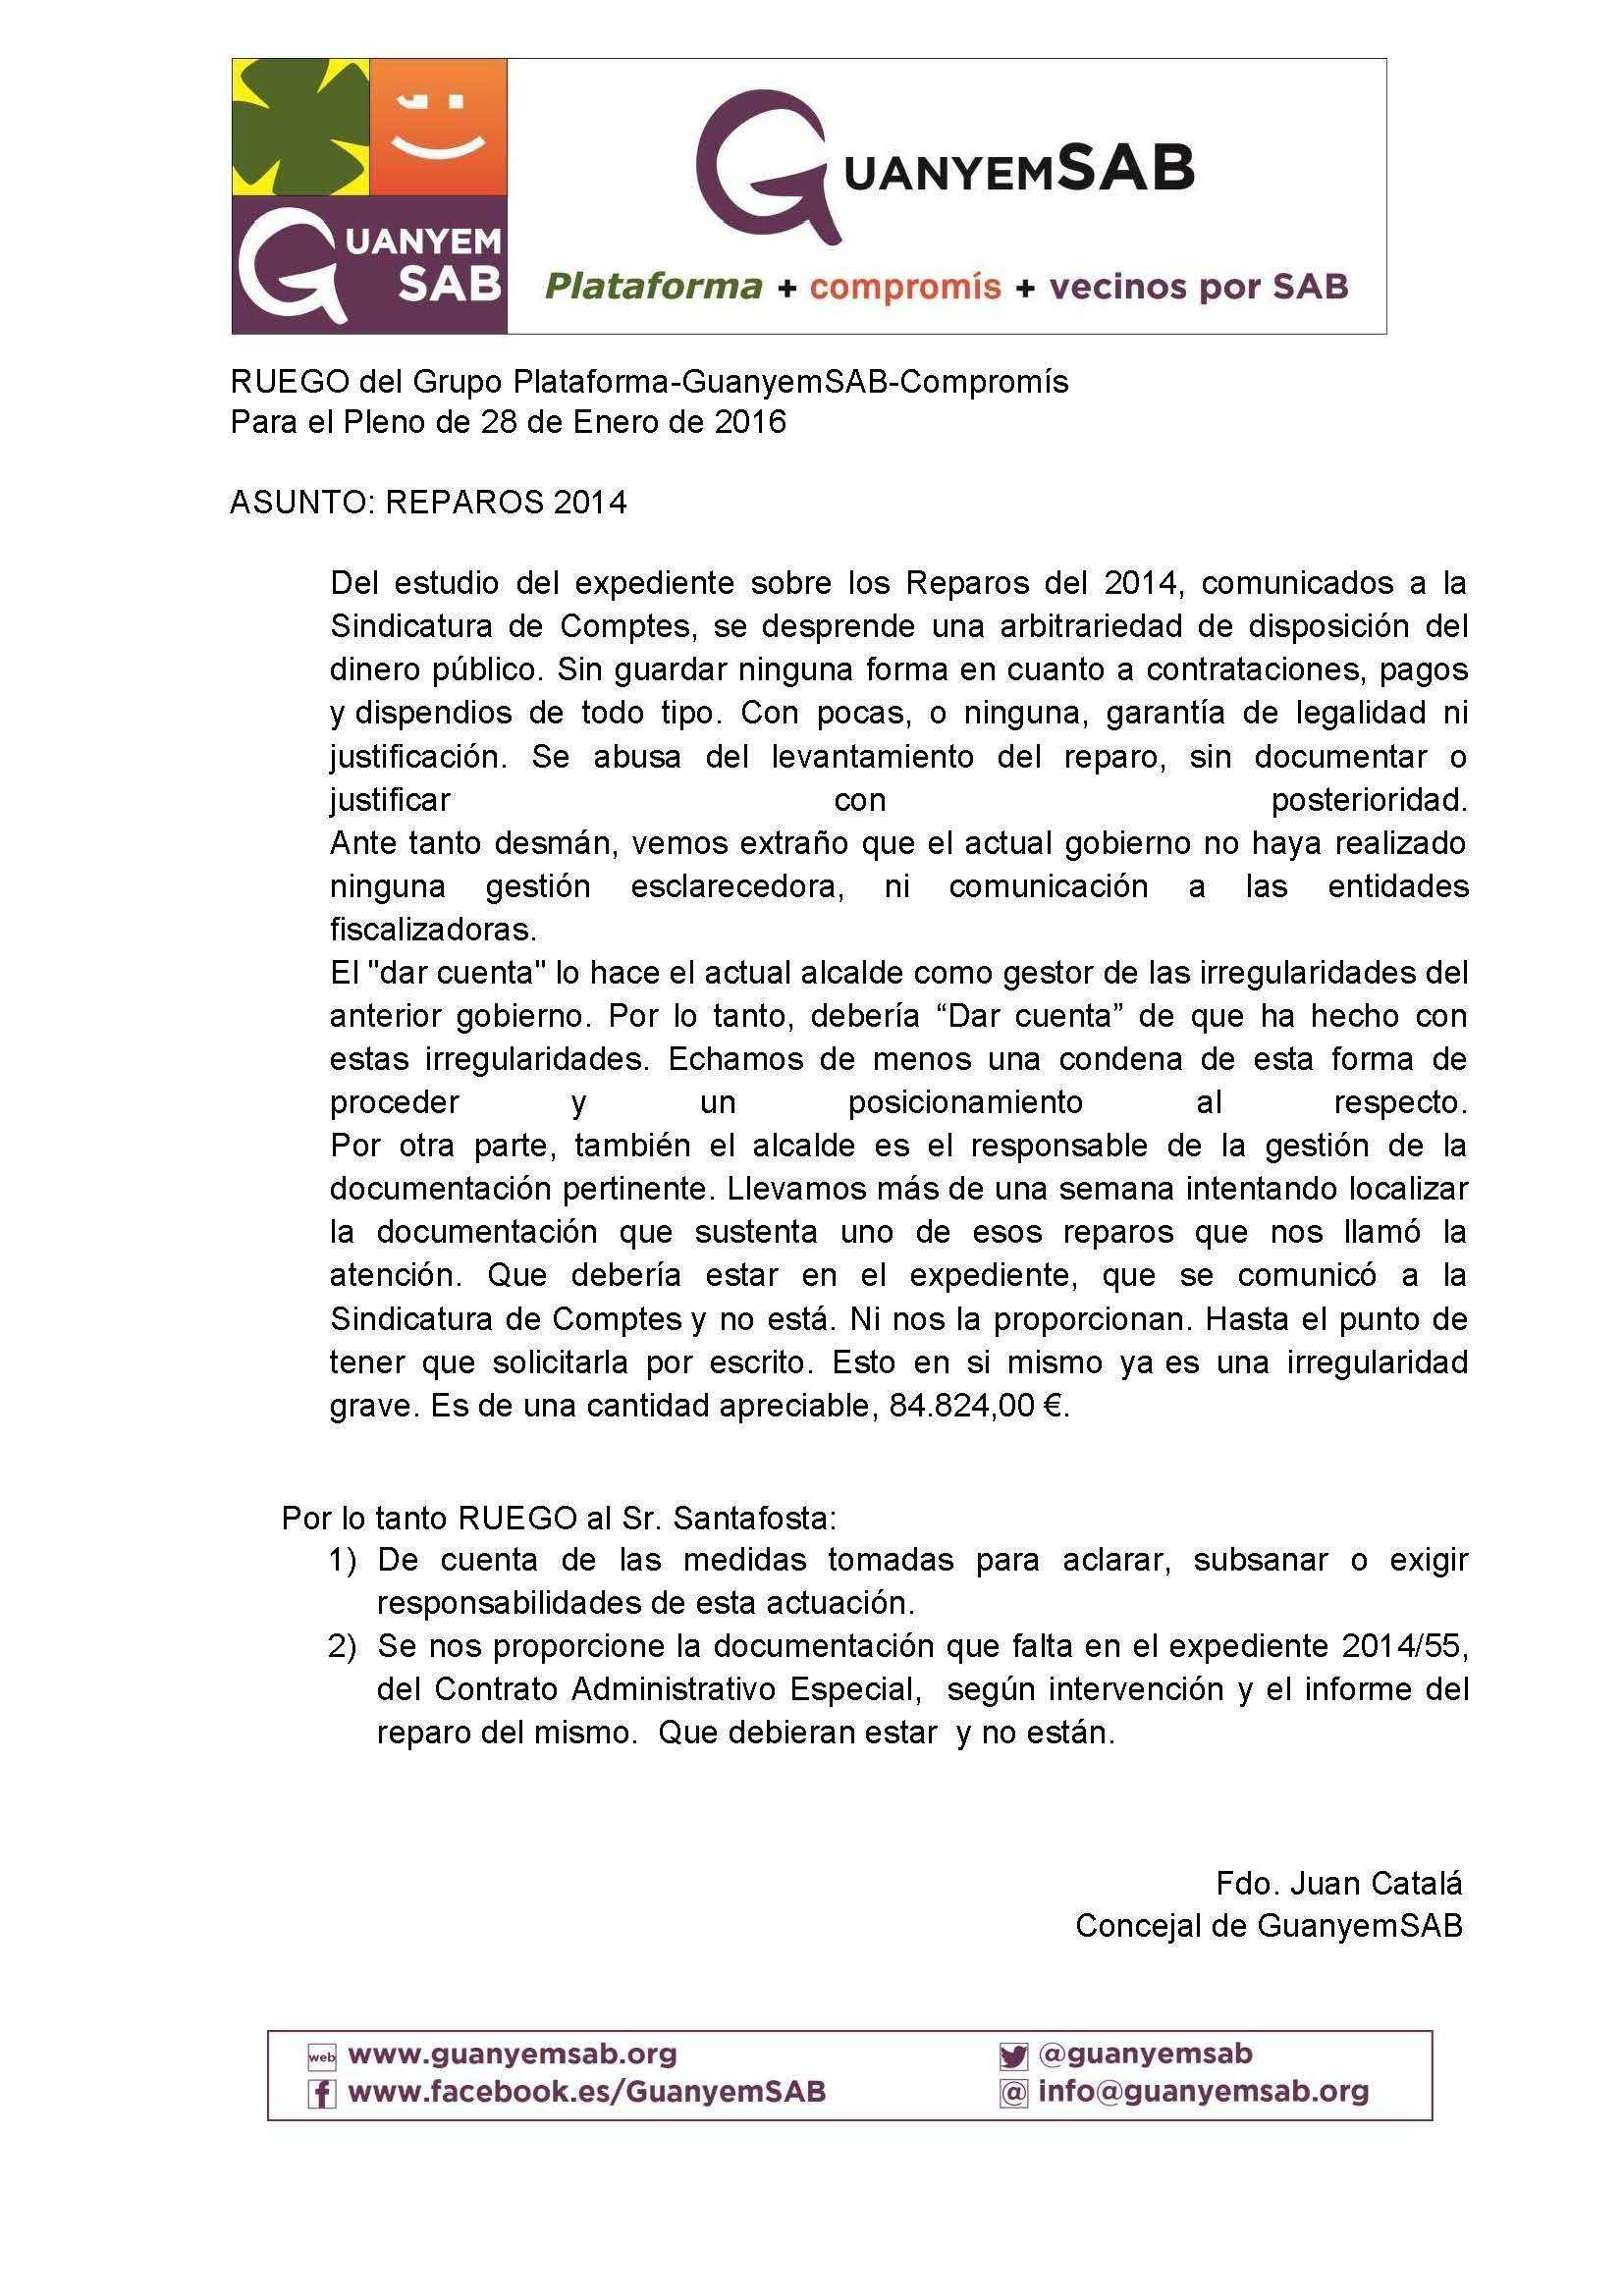 8 - Ruego reparo 2014-55